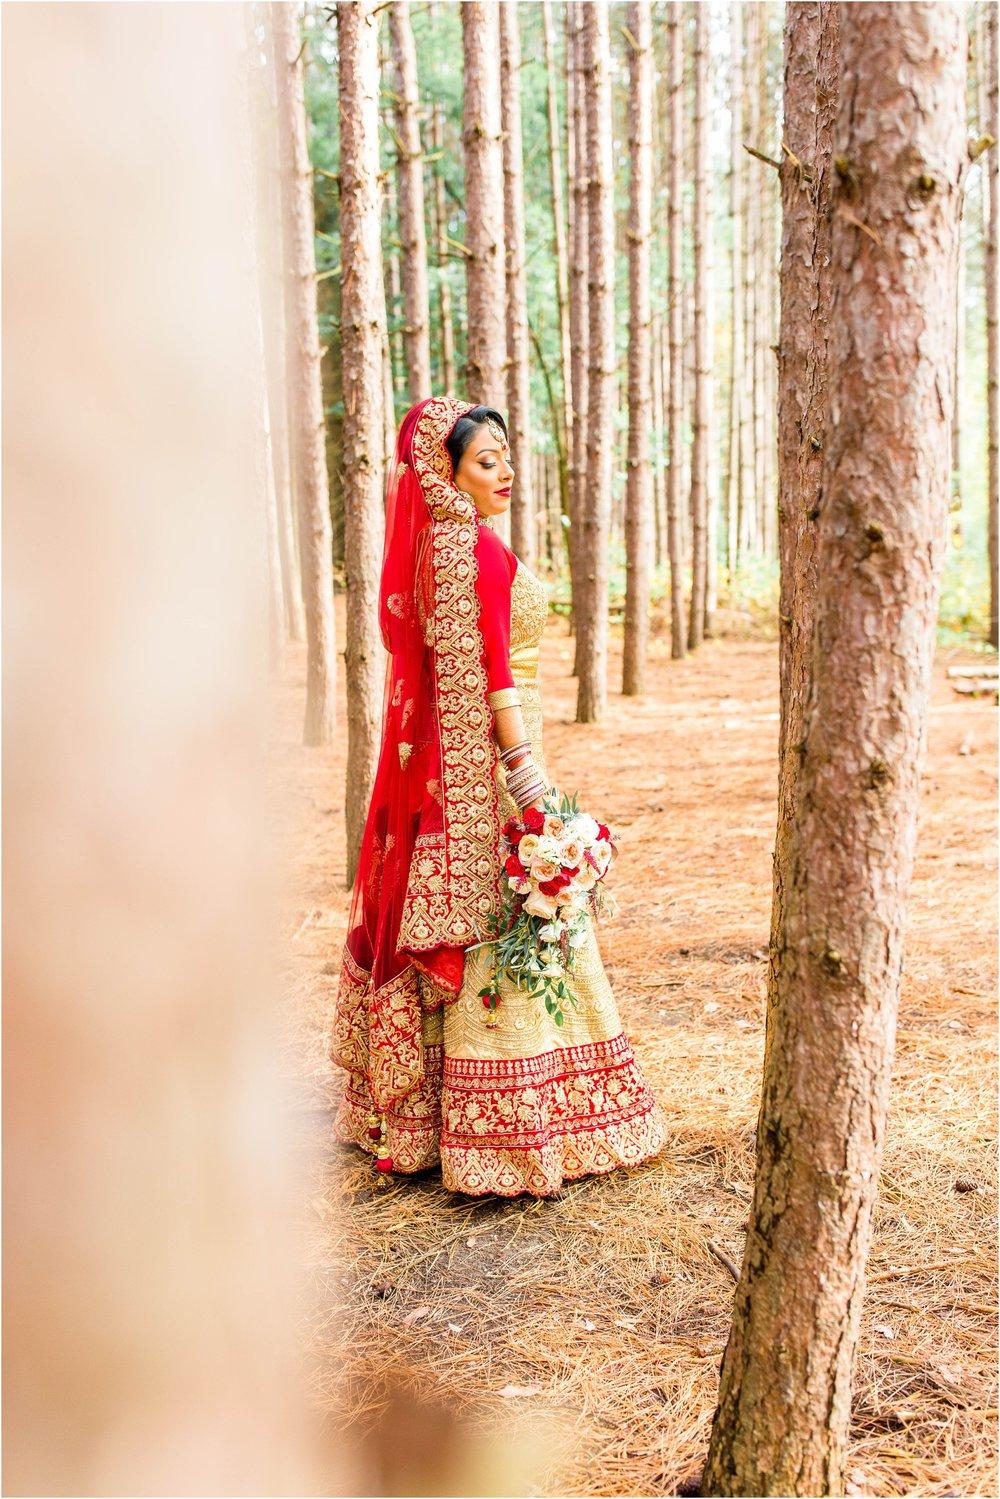 Best-of-2017-Weddings-Toronto-Mississauga-Brampton-Scarborough-GTA-Pakistani-Indian-Wedding-Engagement-Photographer-Photography_0085.jpg